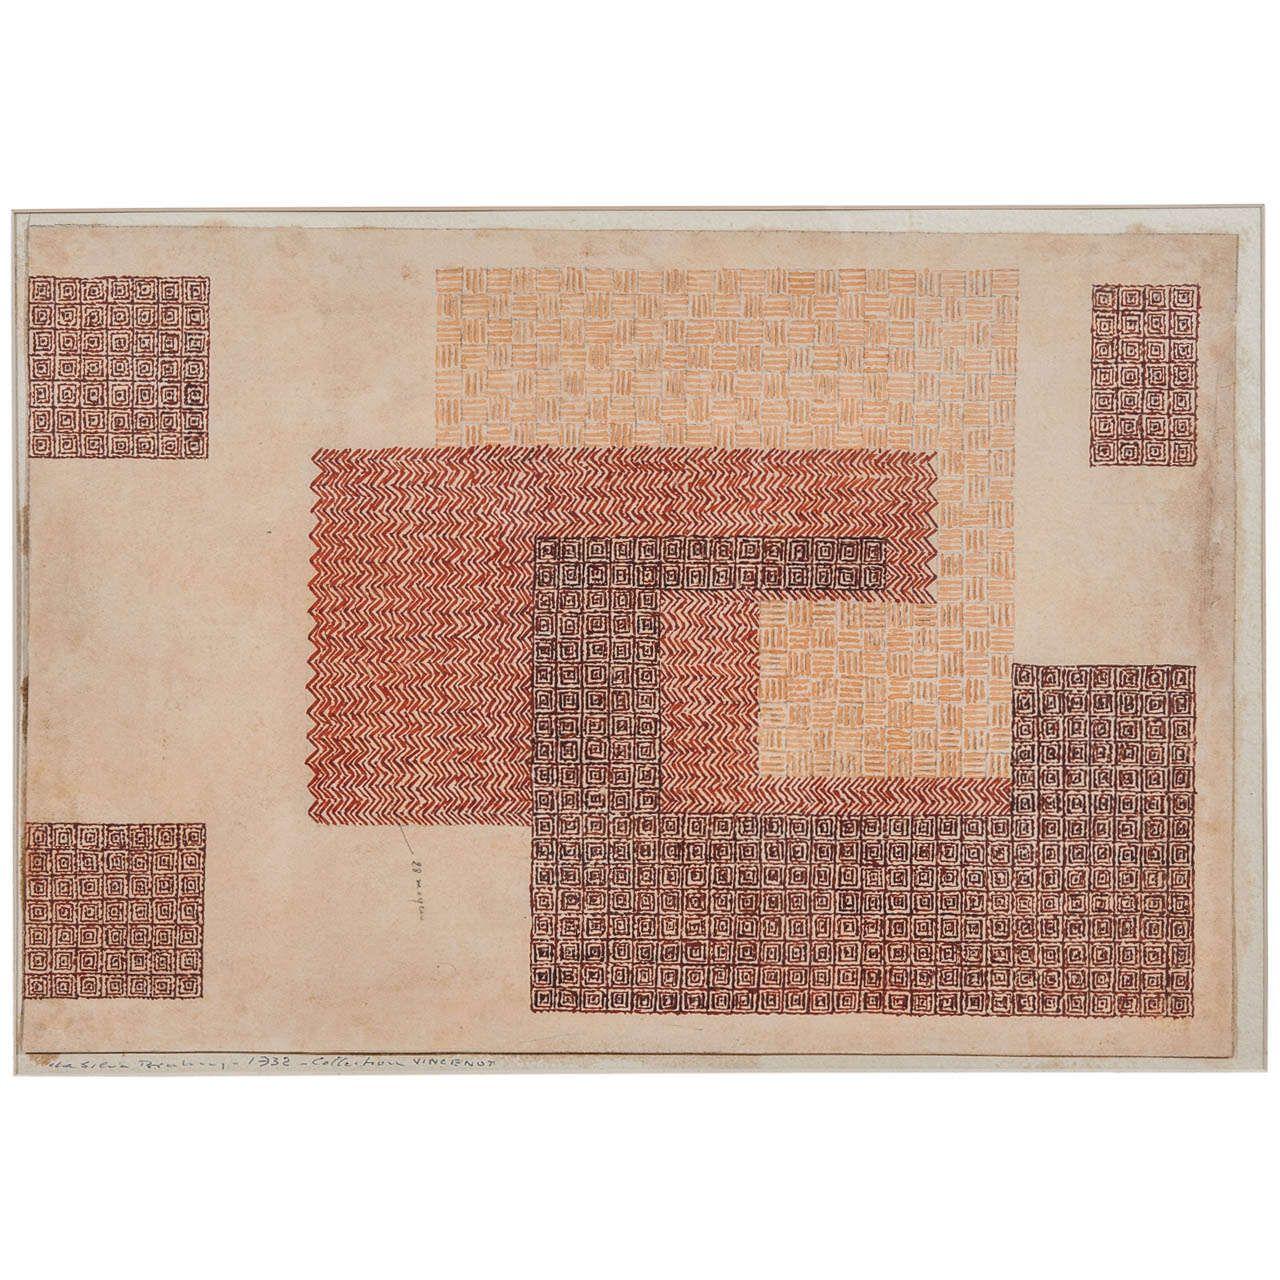 Da silva bruhns cubist carpet design study carpet design wall